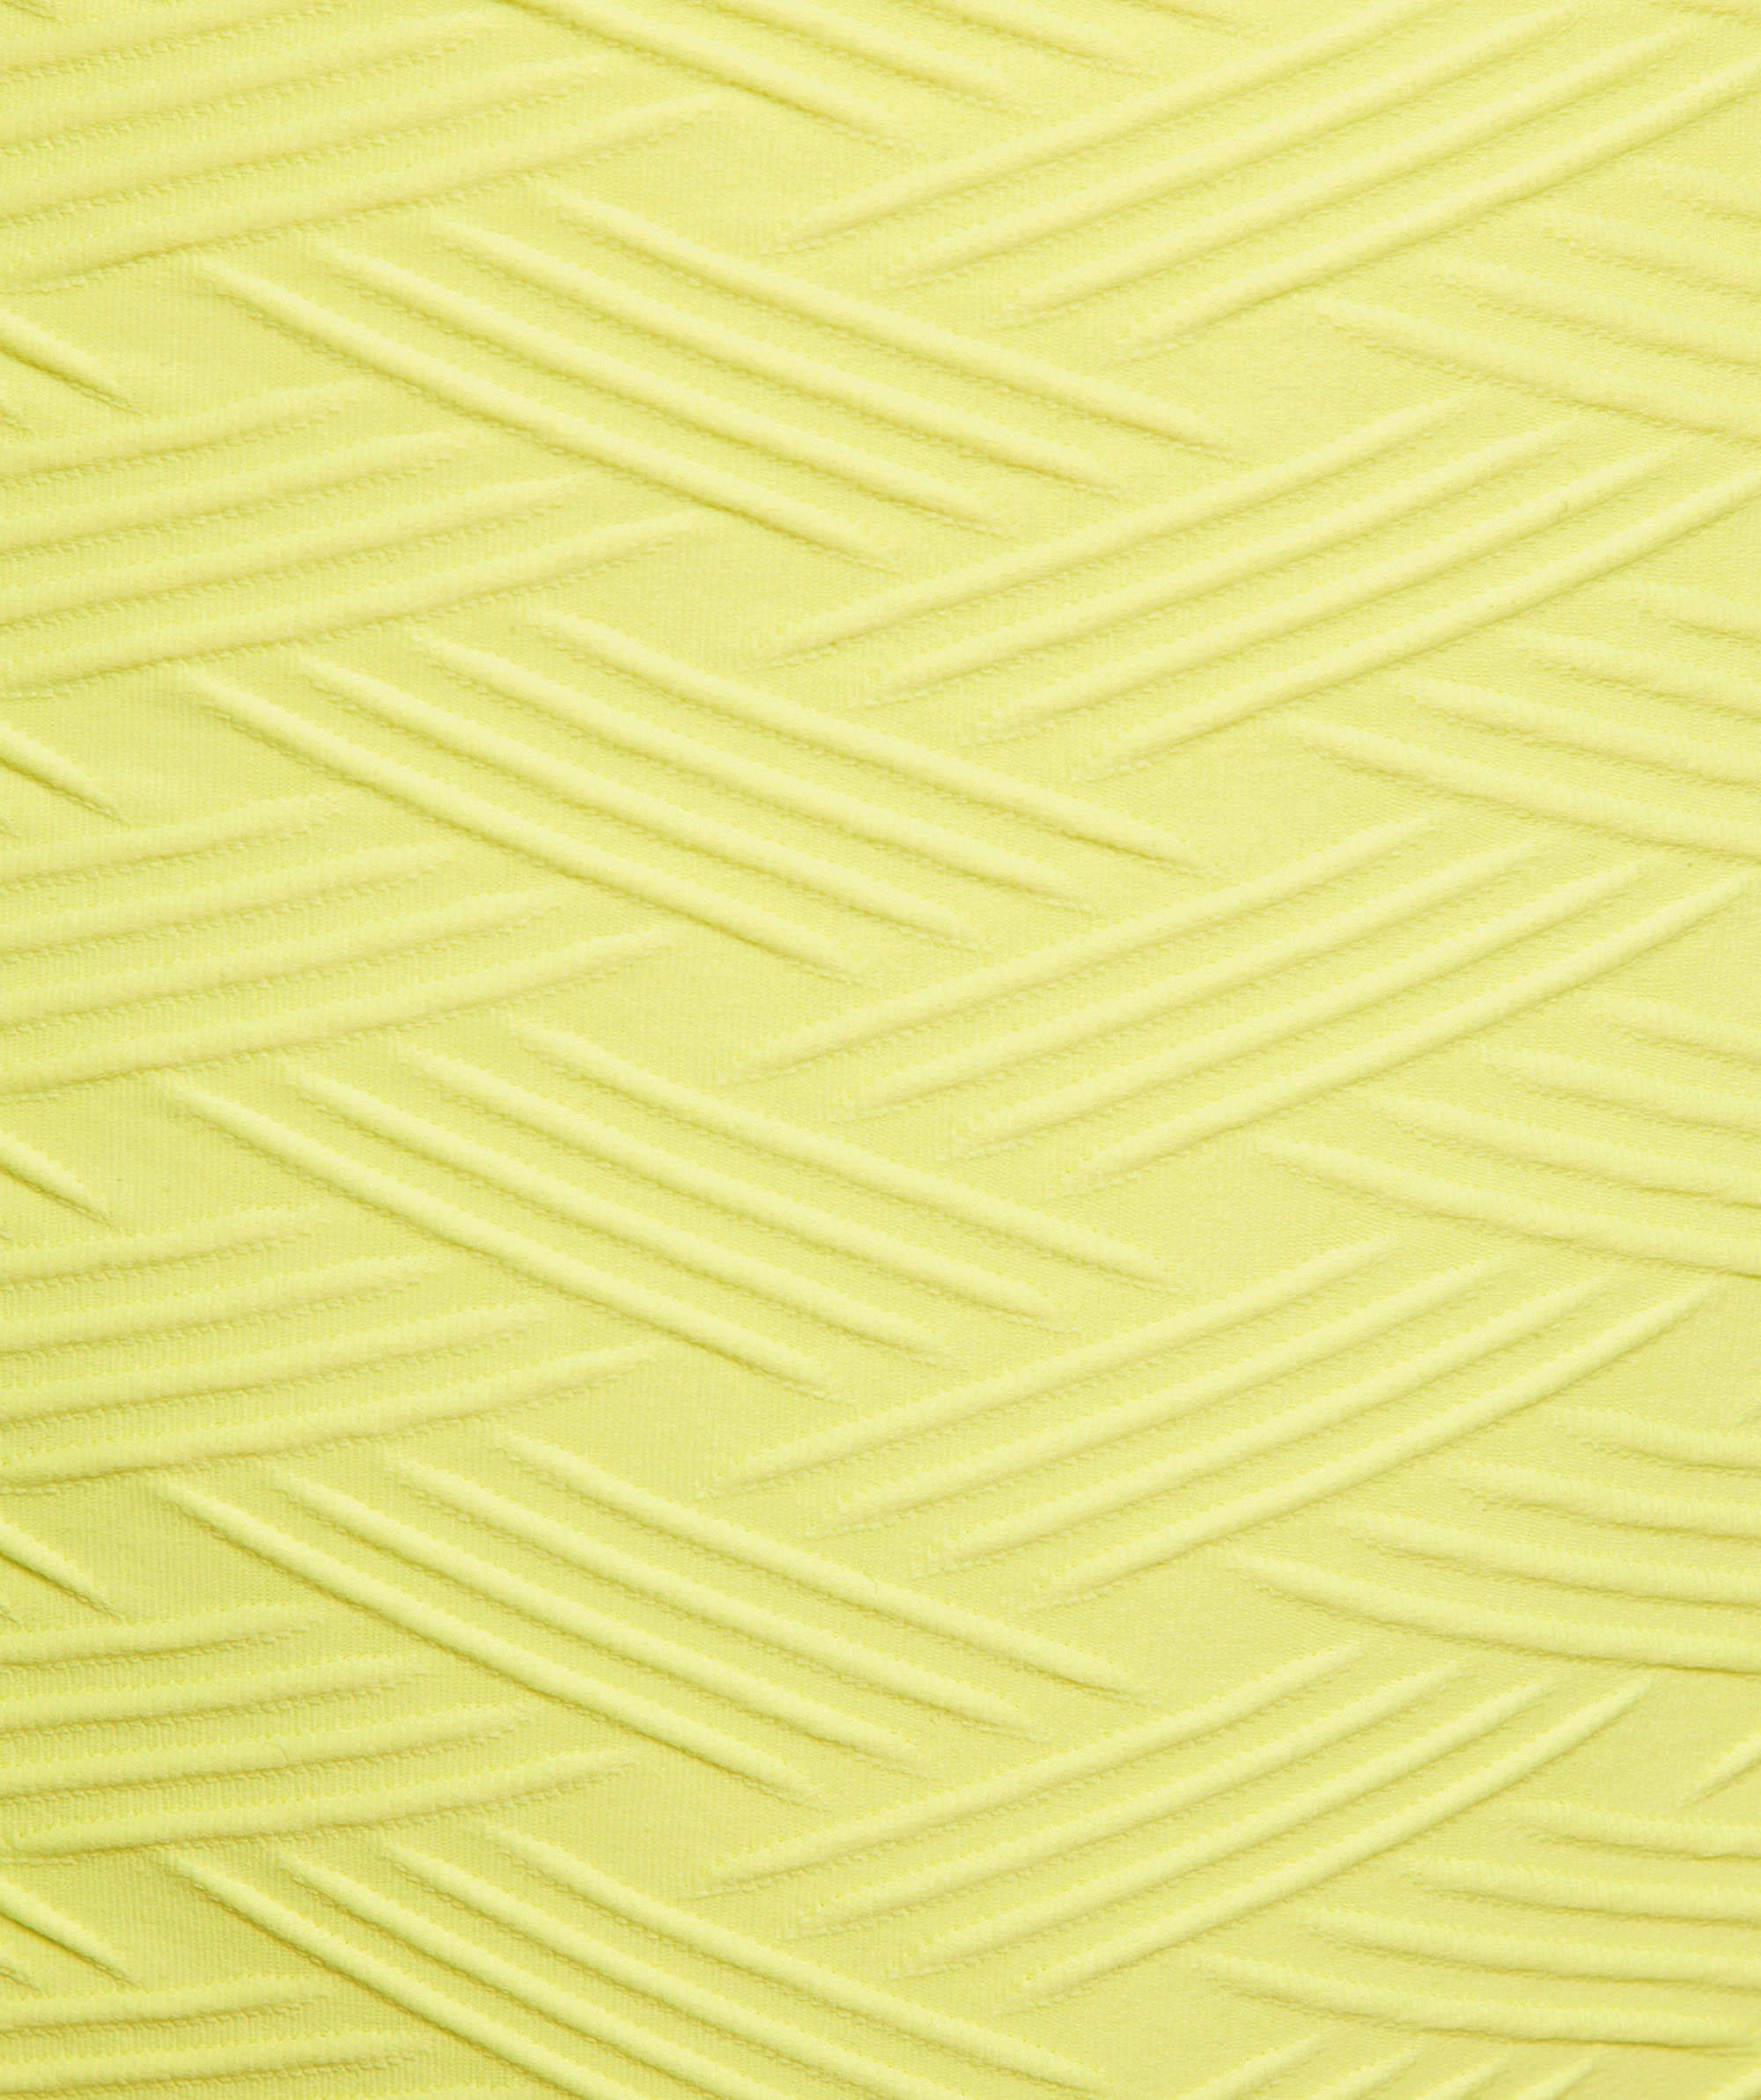 Vamp Vixen High Pants Swim Bottoms - Light Yellow